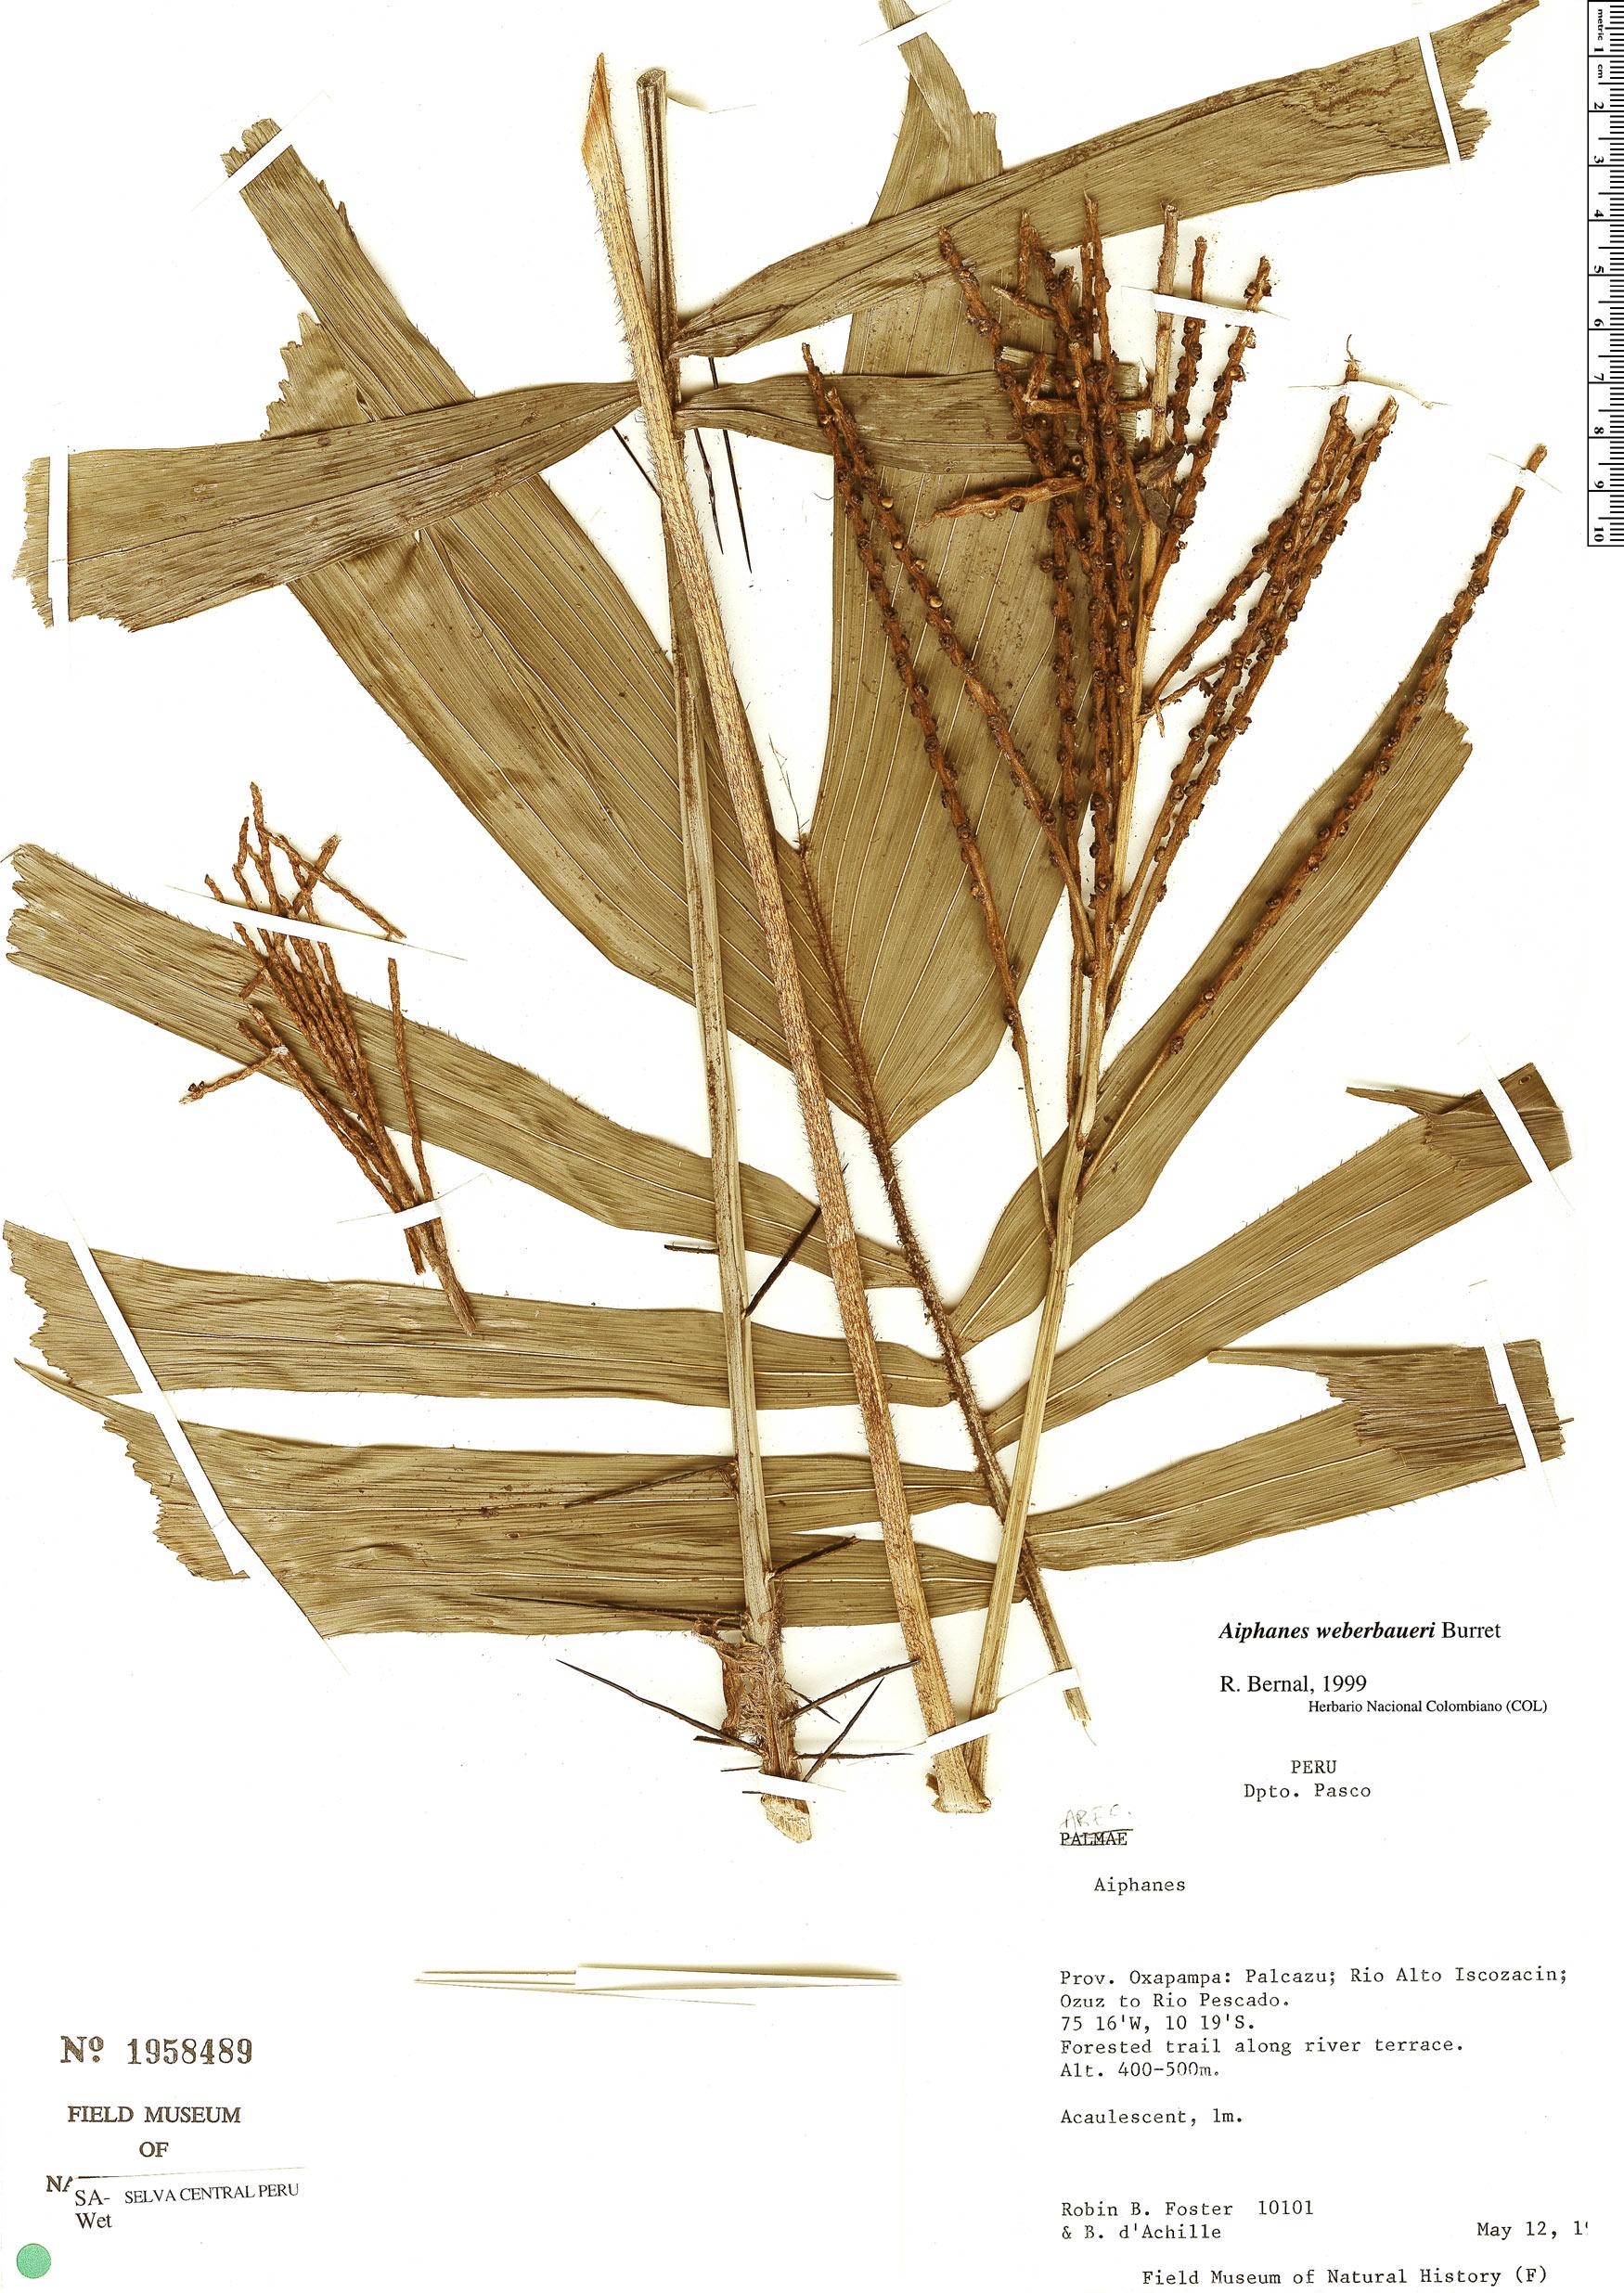 Specimen: Aiphanes weberbaueri